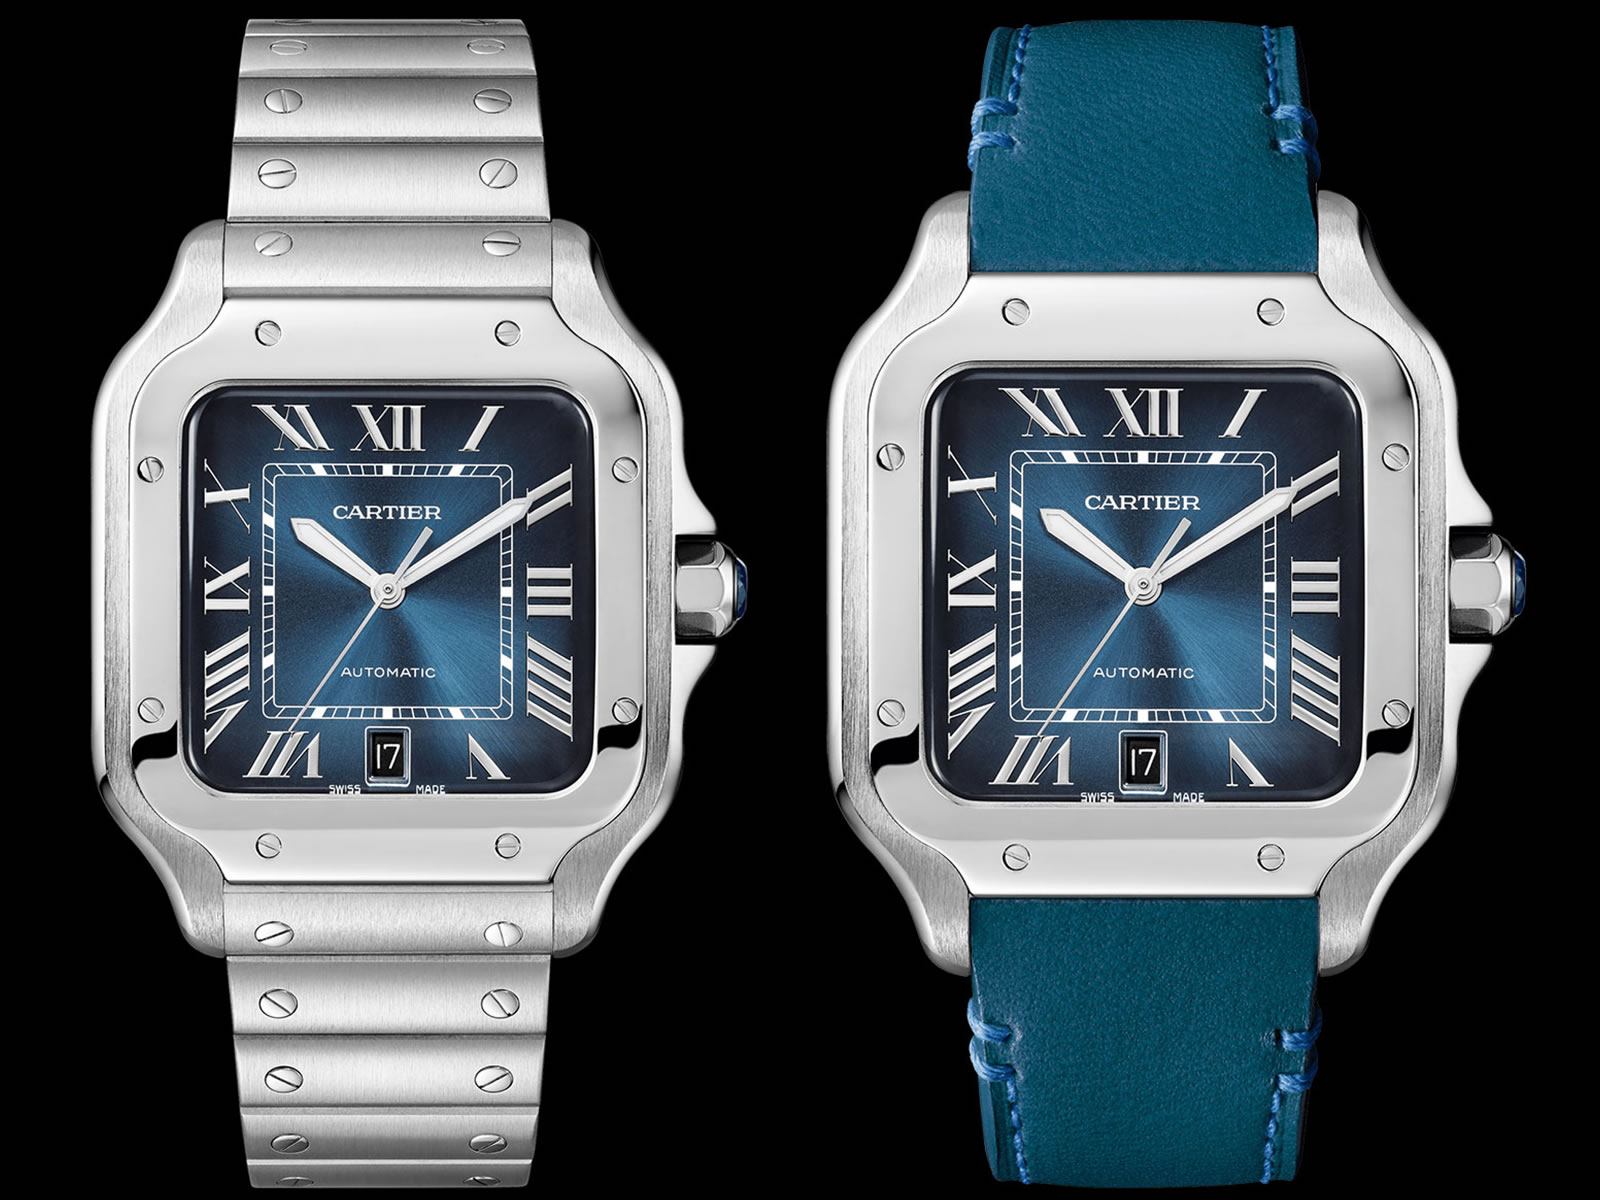 wssa0013-cartier-santos-gradient-blue-dial-4-.jpg